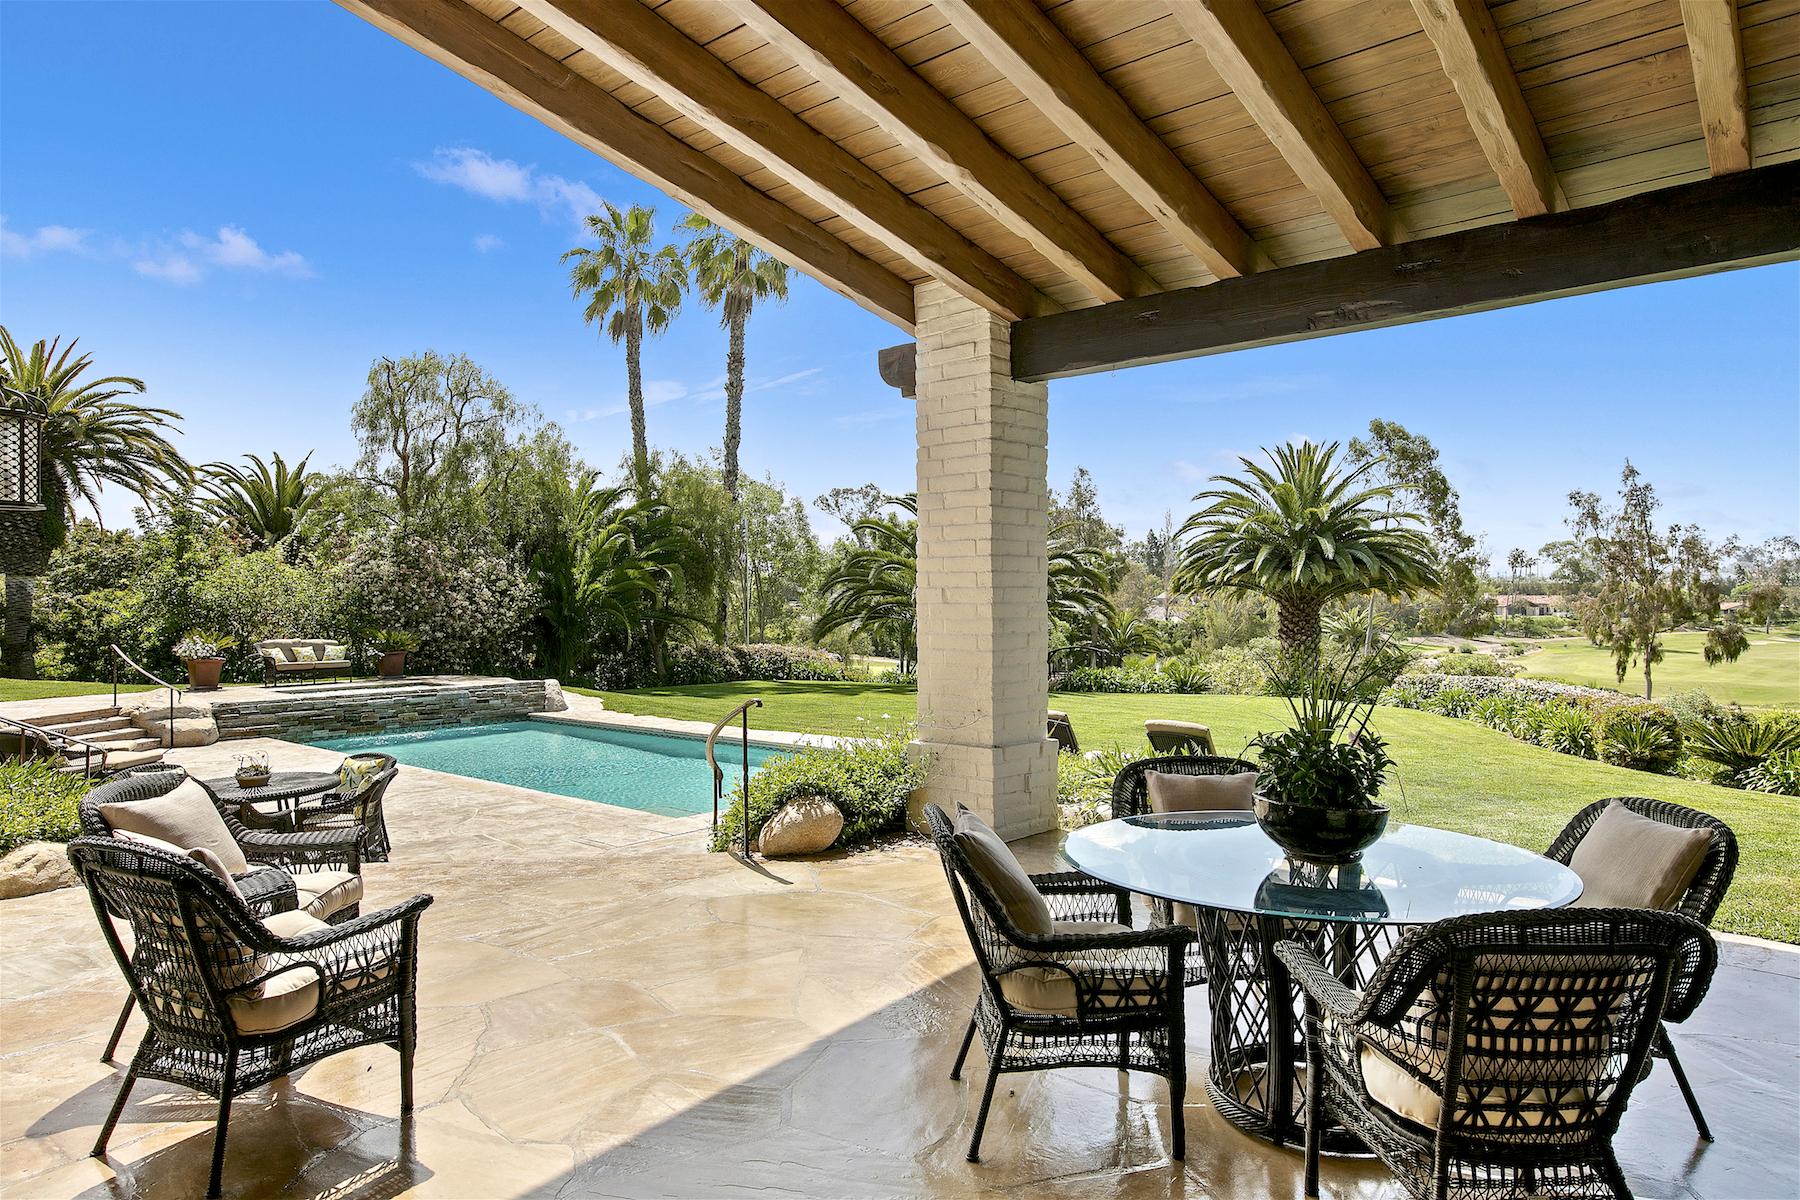 6083 Mimulus -  Rancho Santa Fe, CA 92067